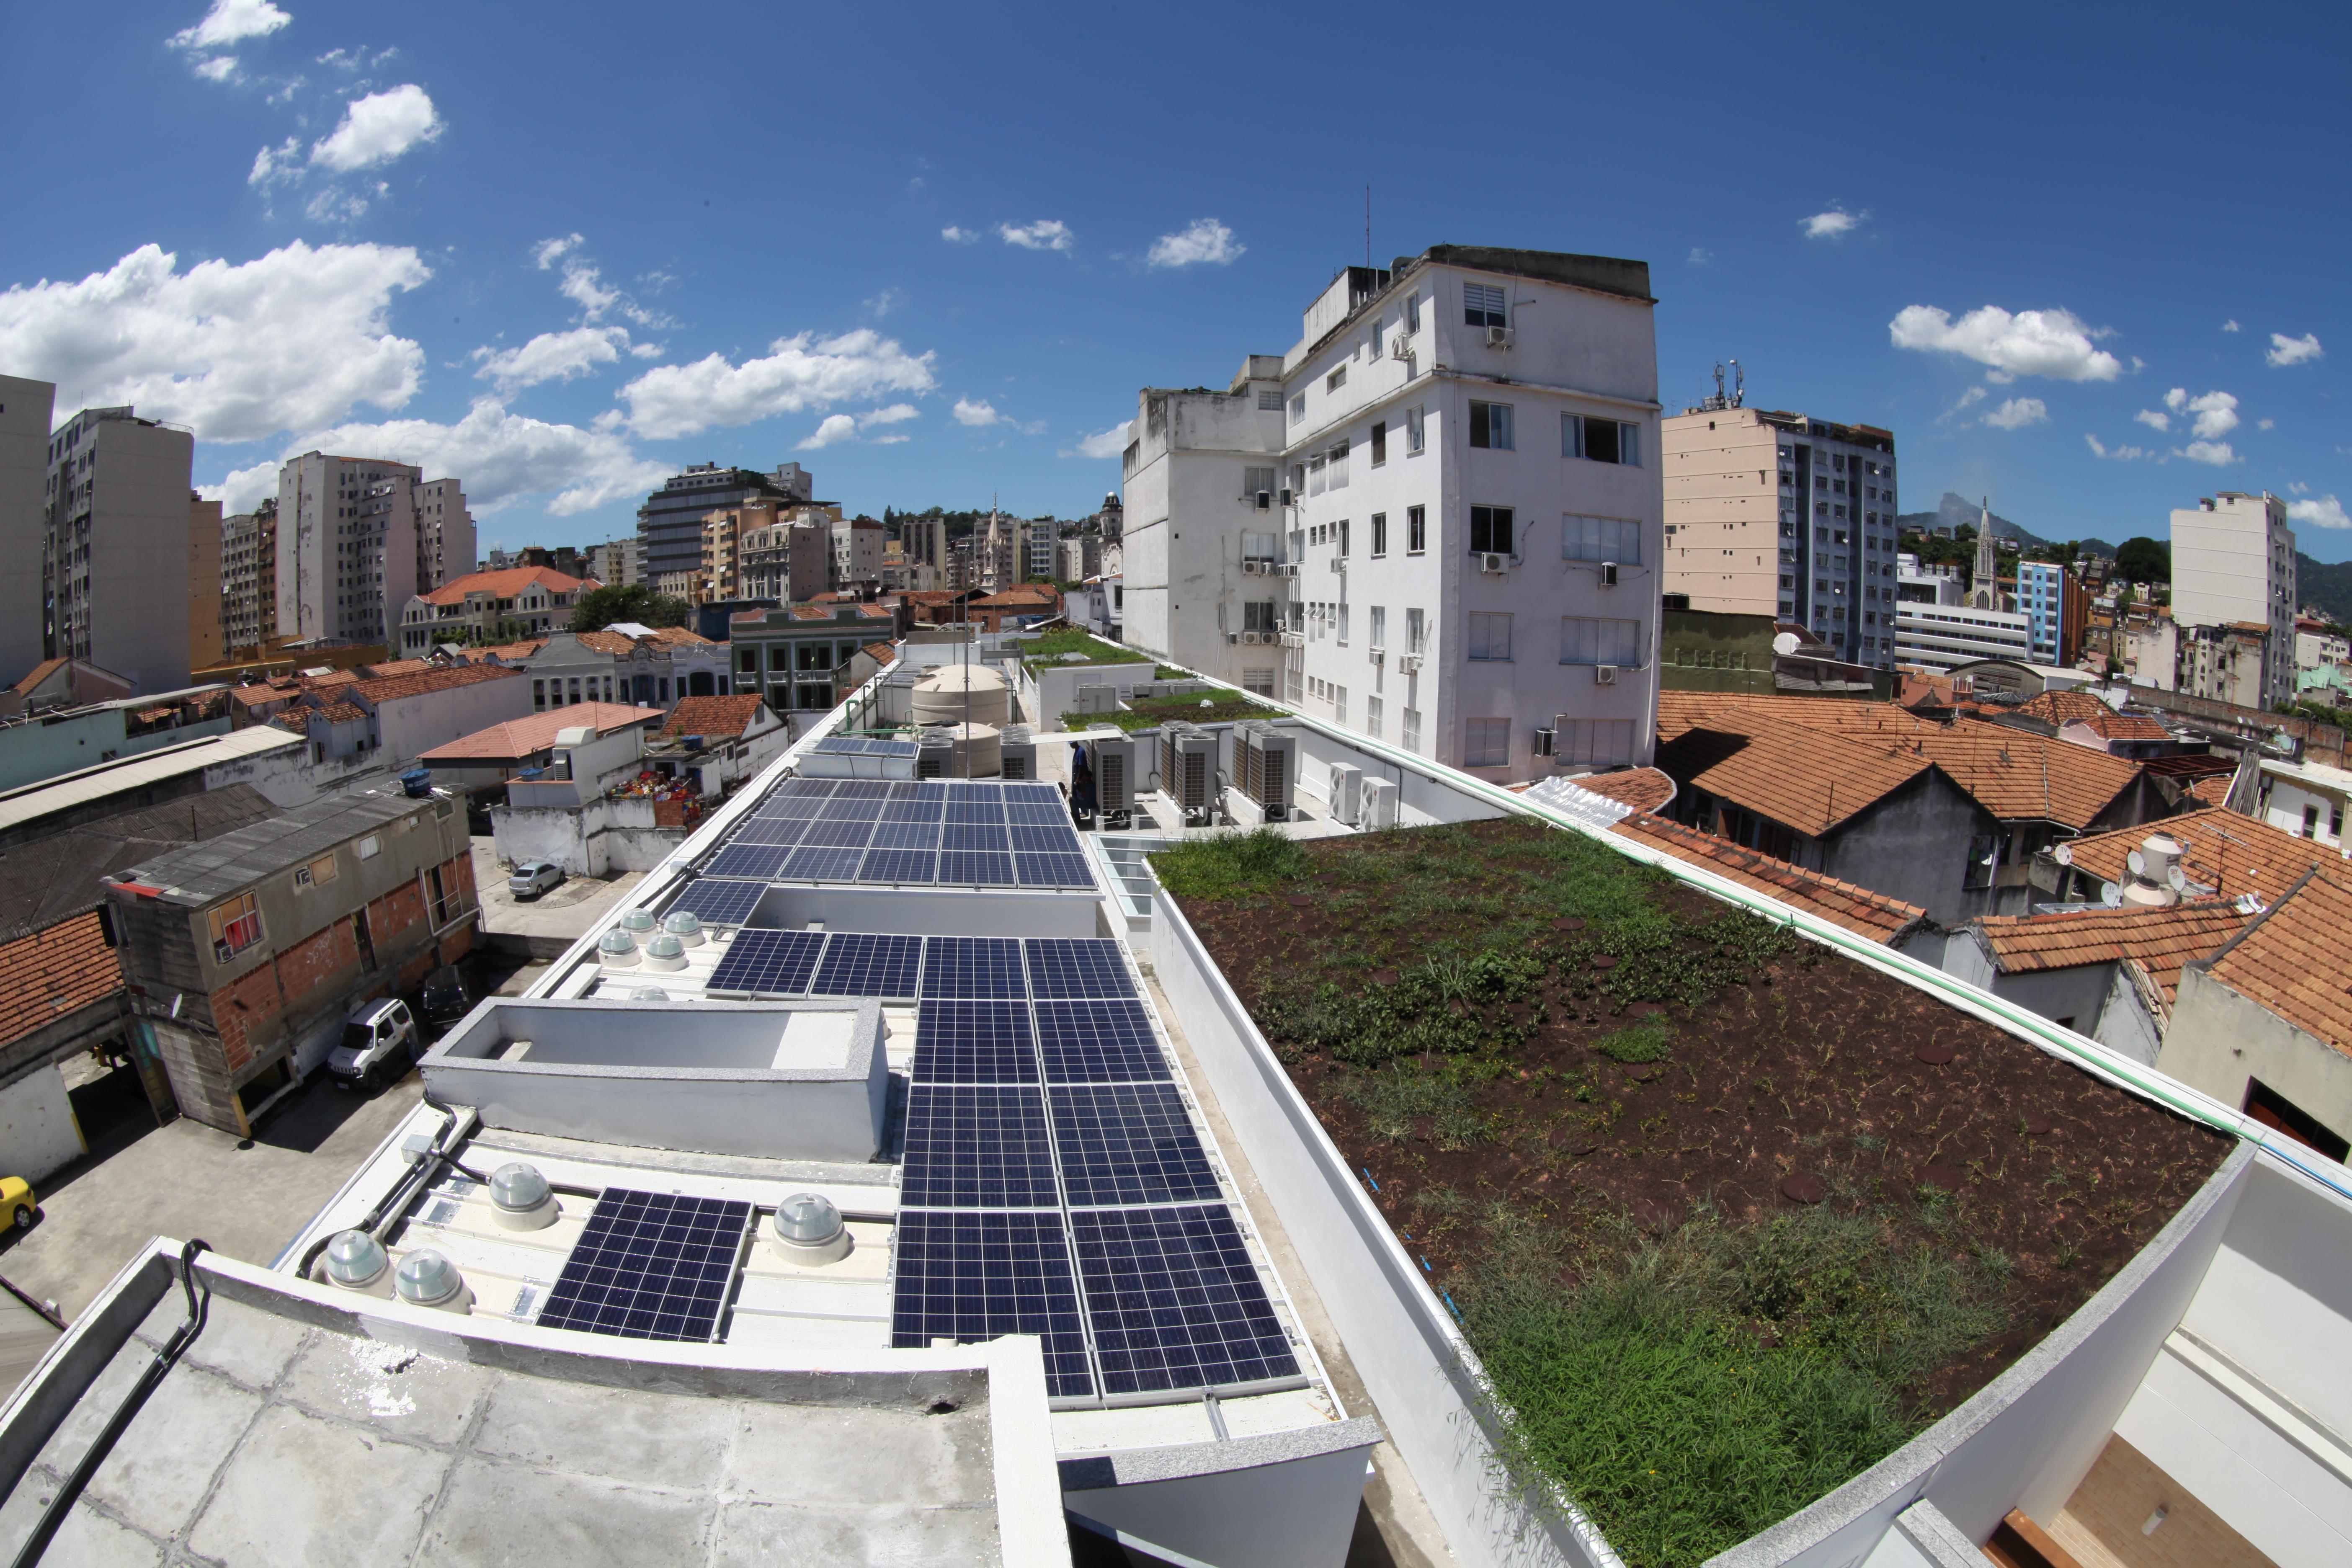 Sinal verde para a sustentabilidade